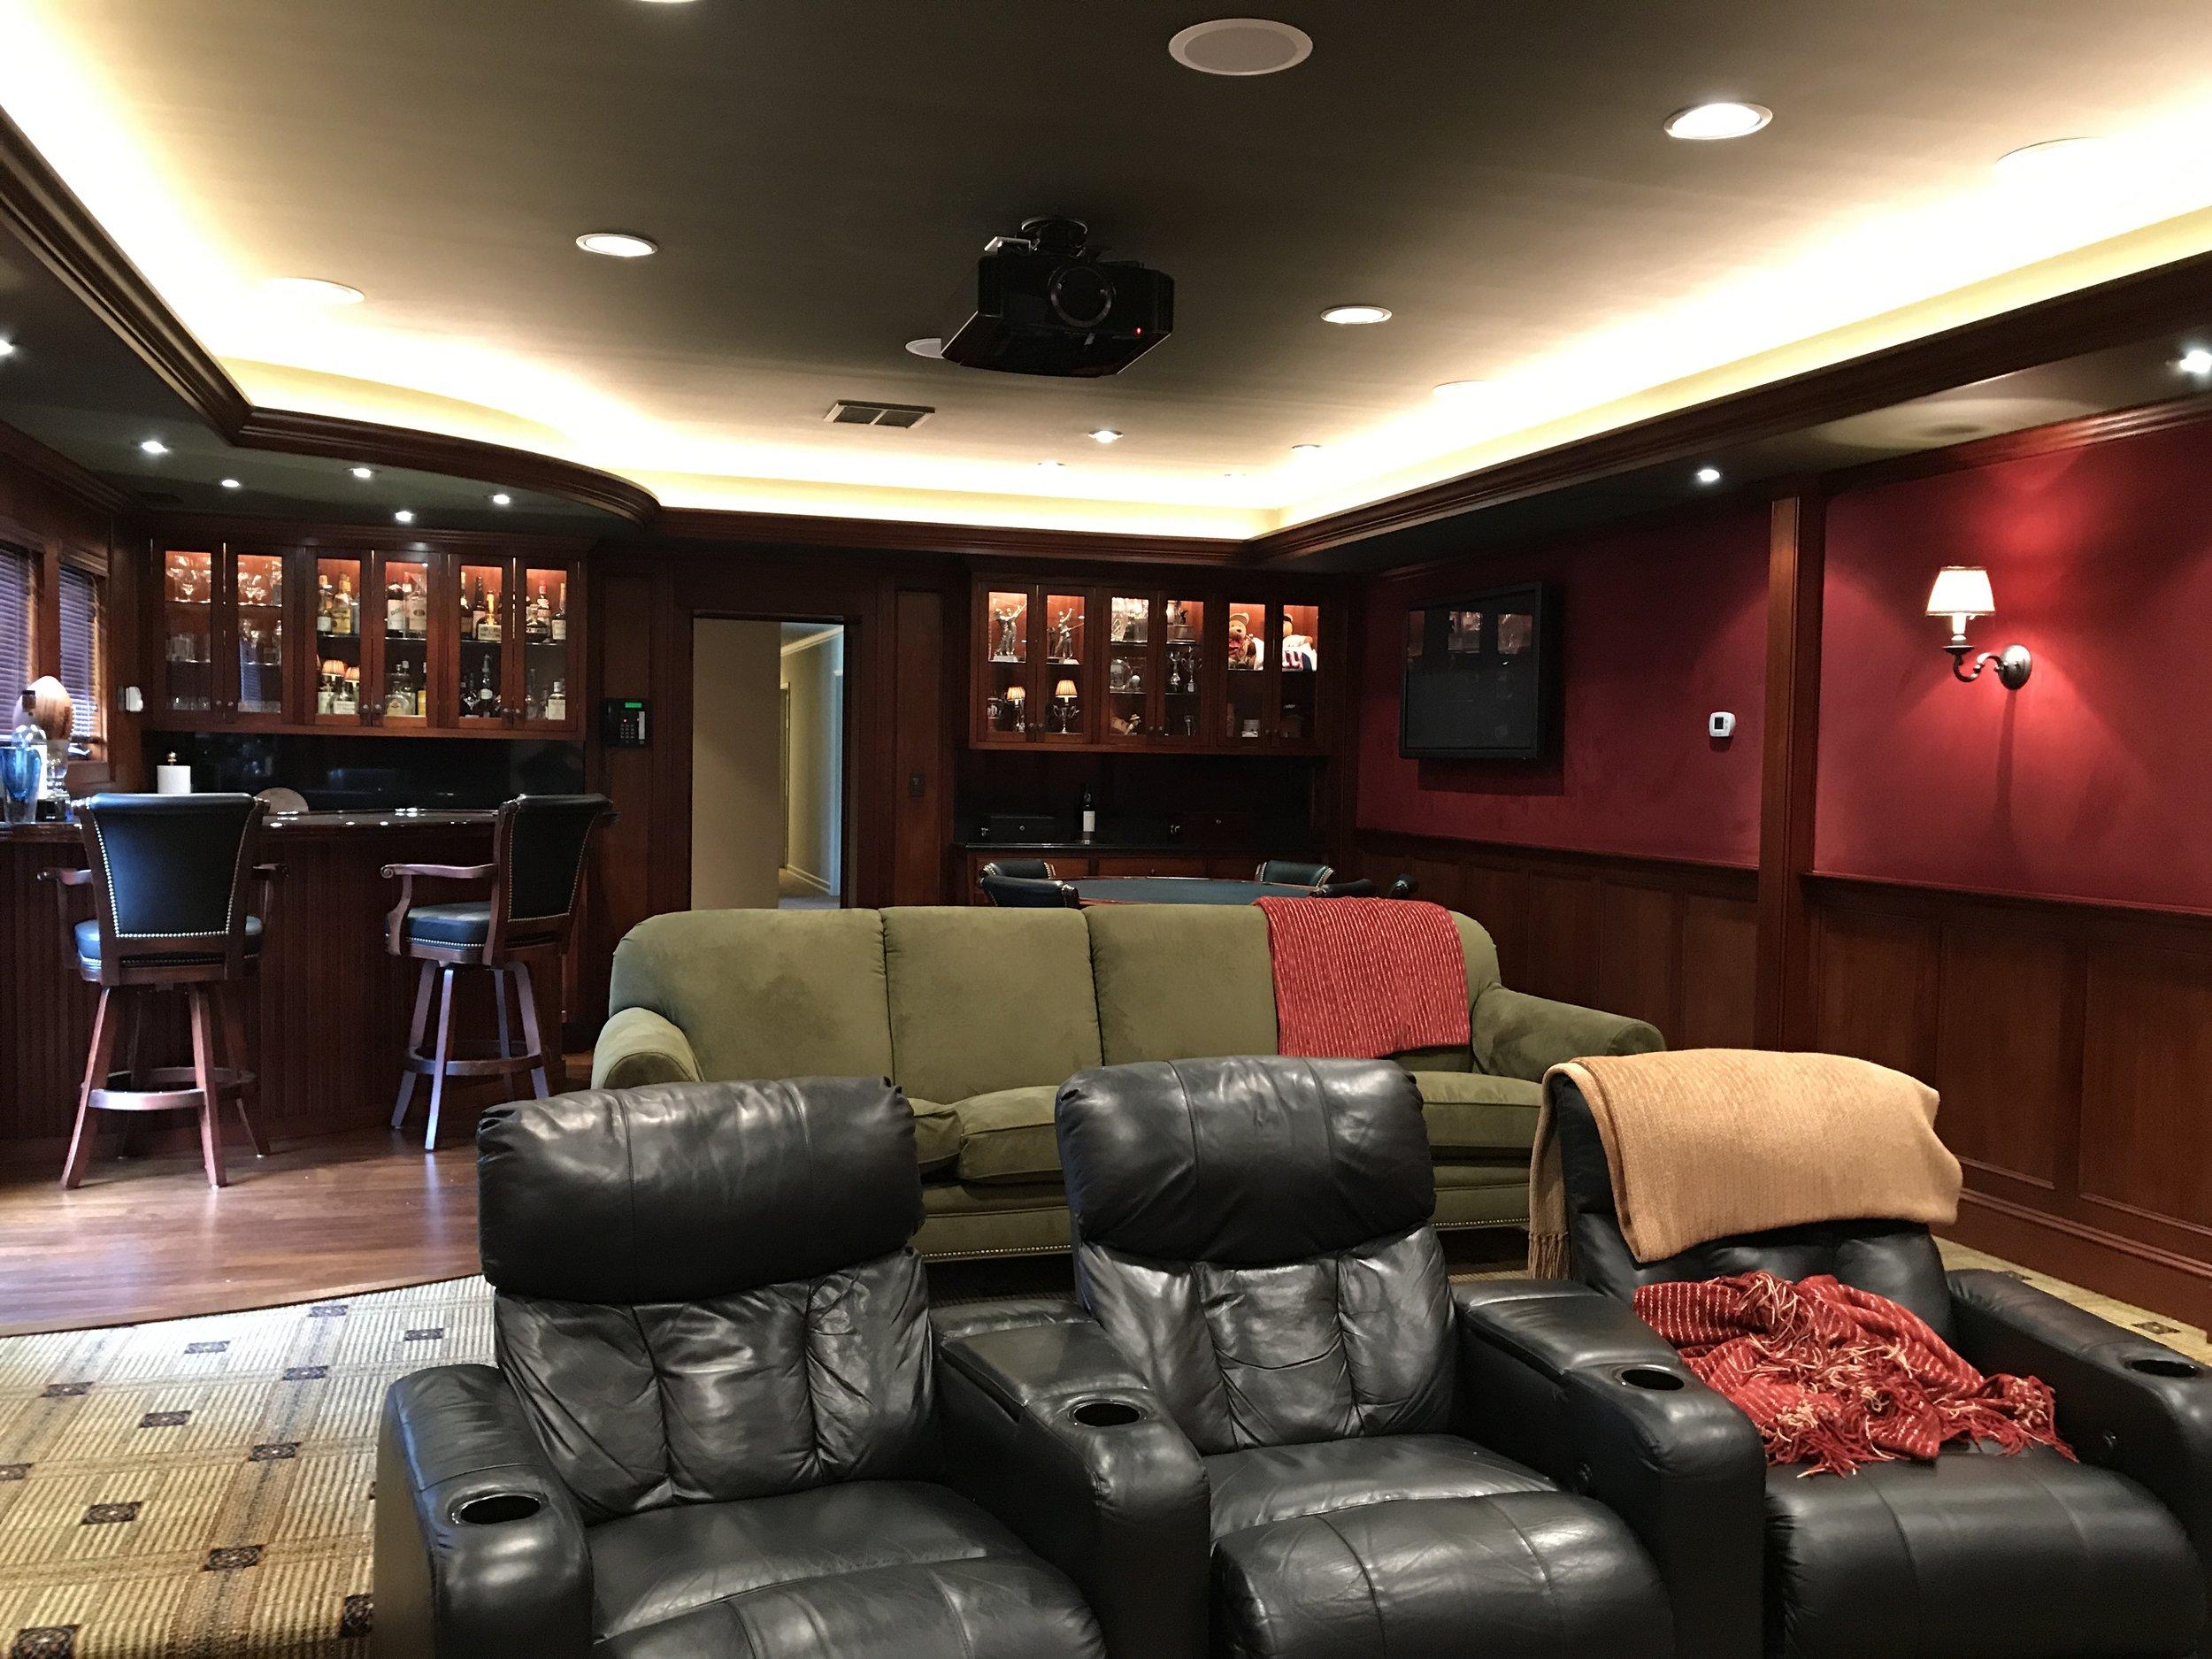 home entertainment design. Home Entertainment Design and Installation  Hudson Valley Media 2 JPG Smart Call 845 613 0640